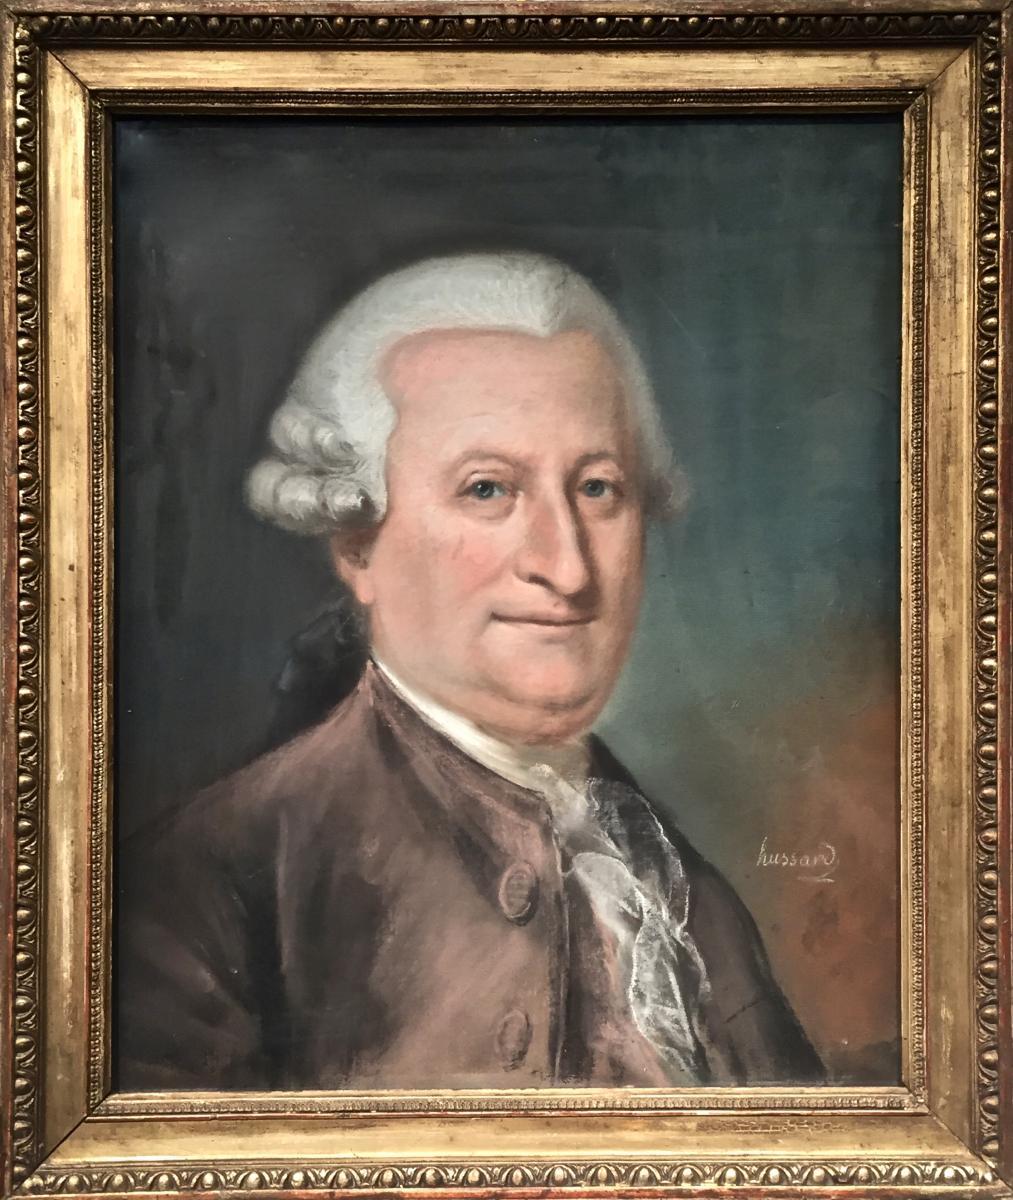 Michel Nicolas HUSSARD (1749-1827) - PORTRAIT XVIIIème